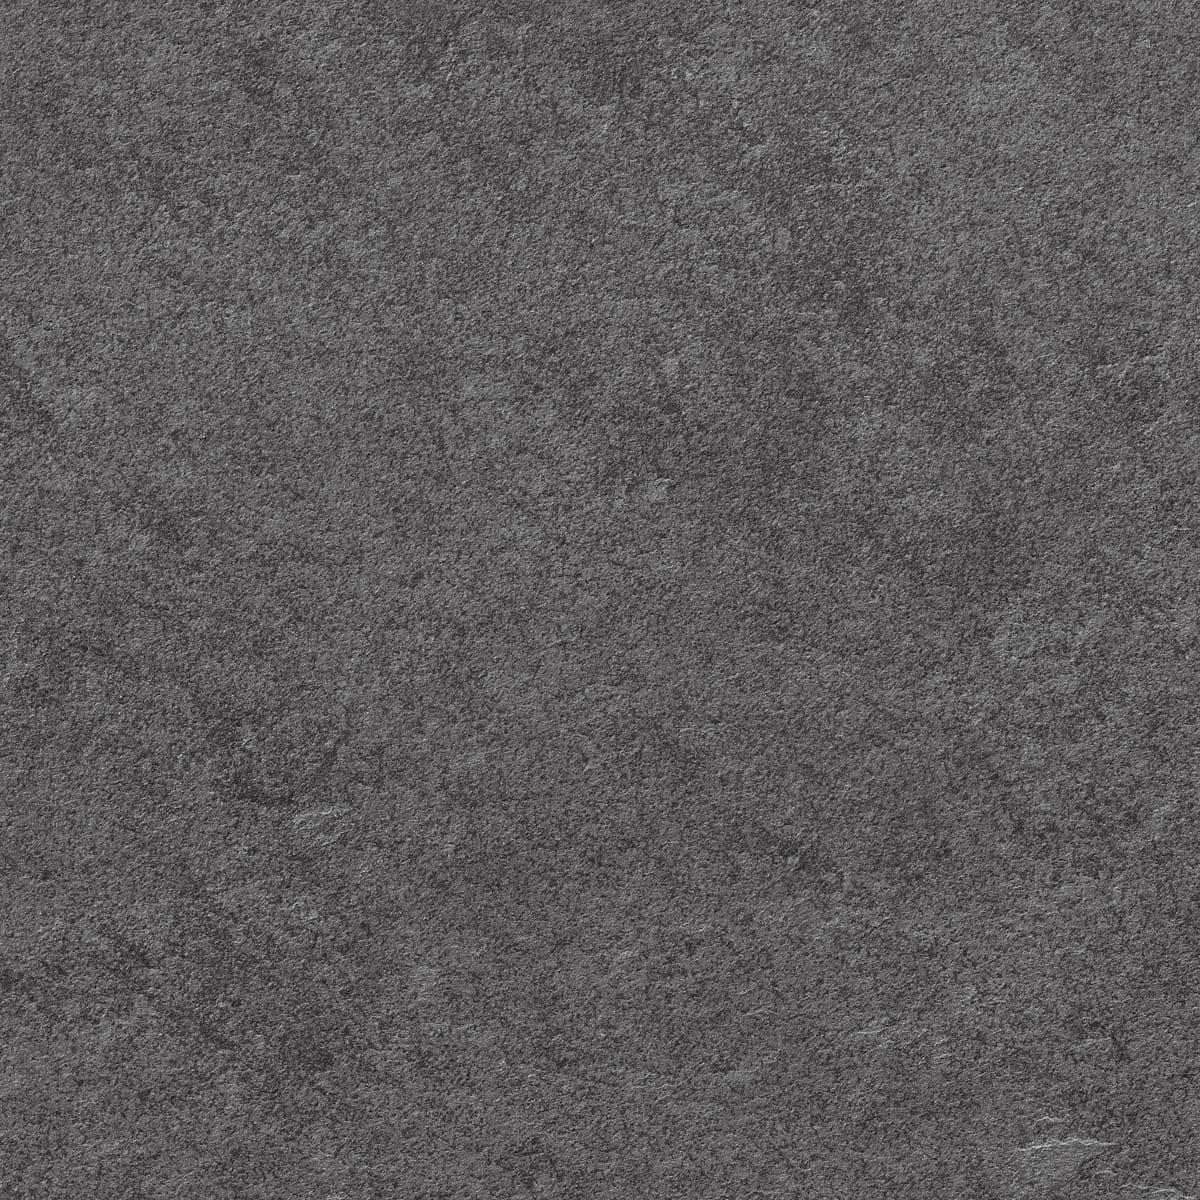 FOTO basalt antracita antideslizante 59x59